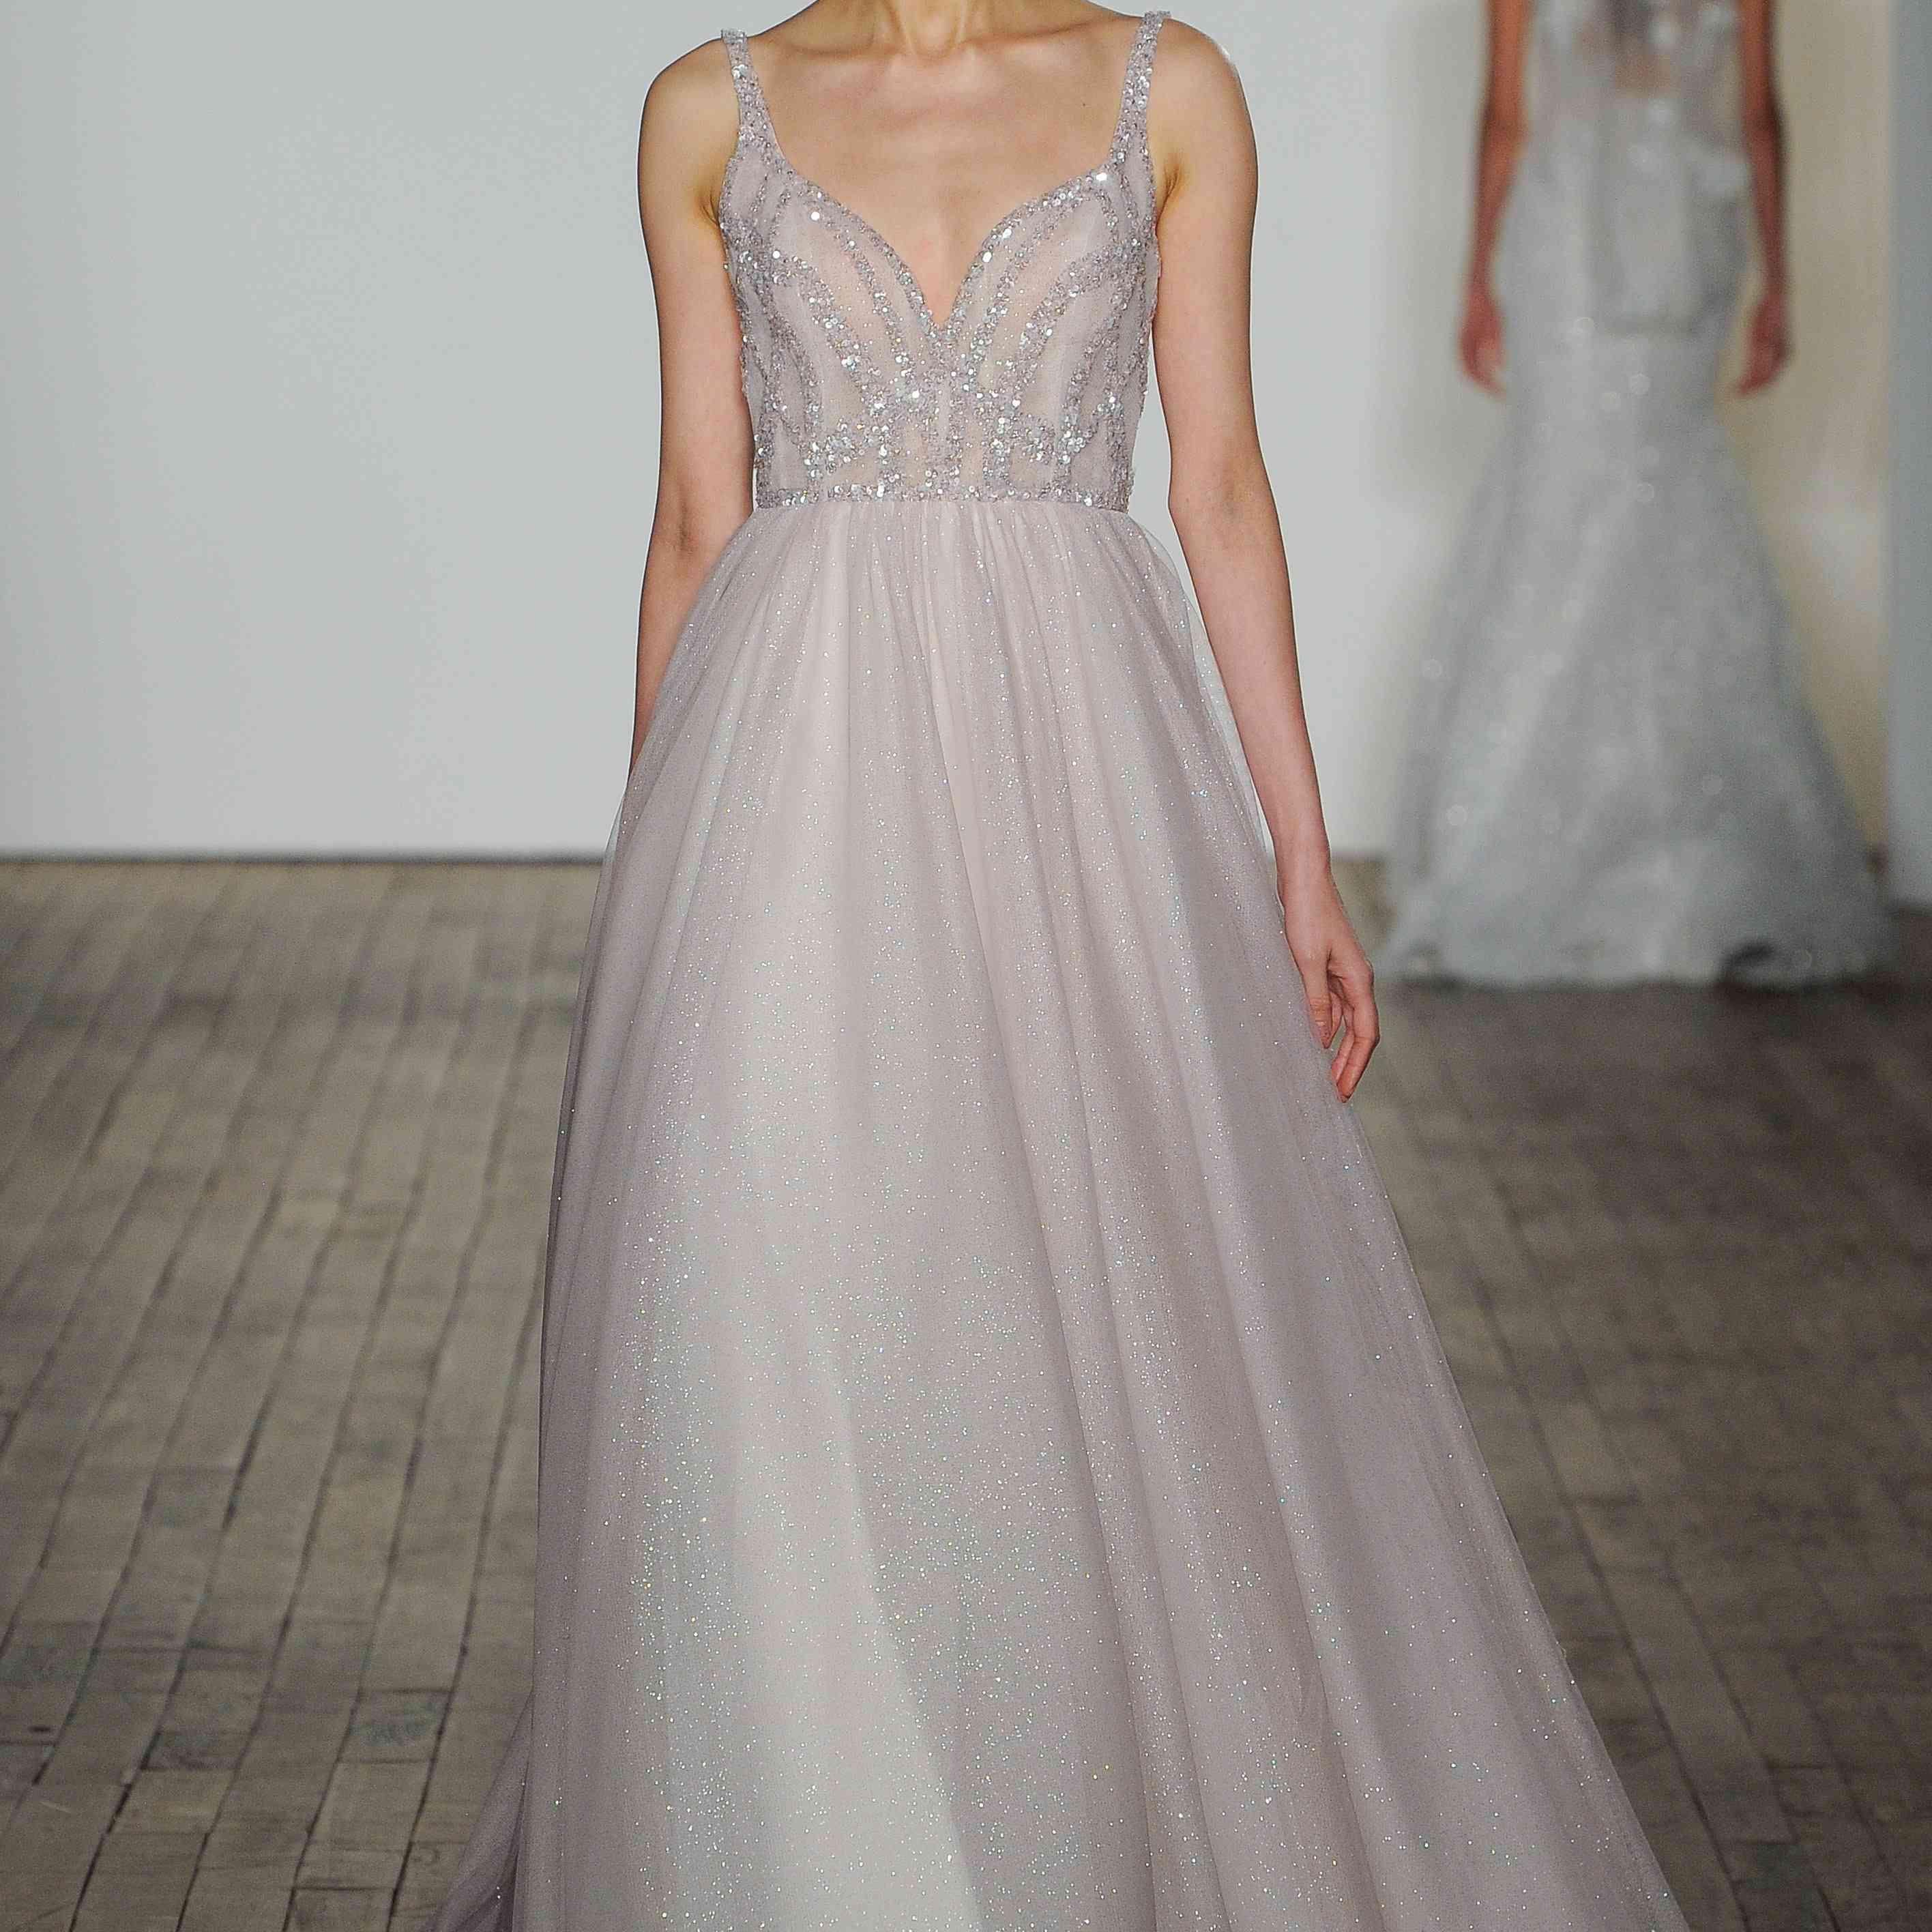 Stassi pink wedding dress